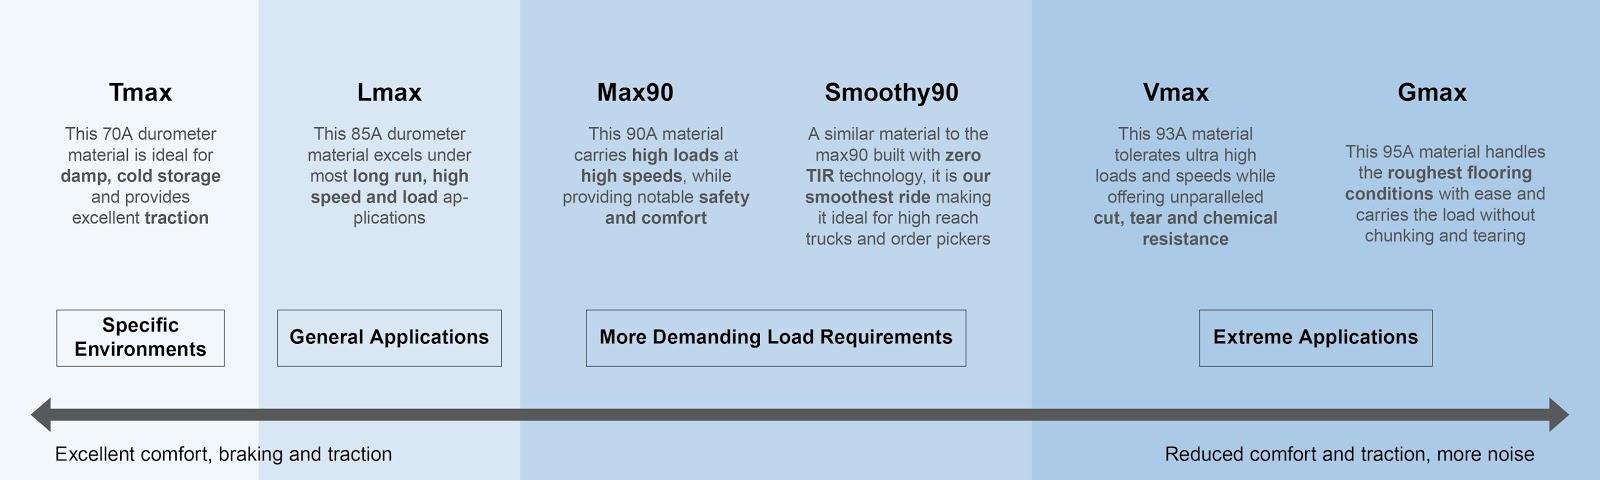 range of properties, polyurethane tires